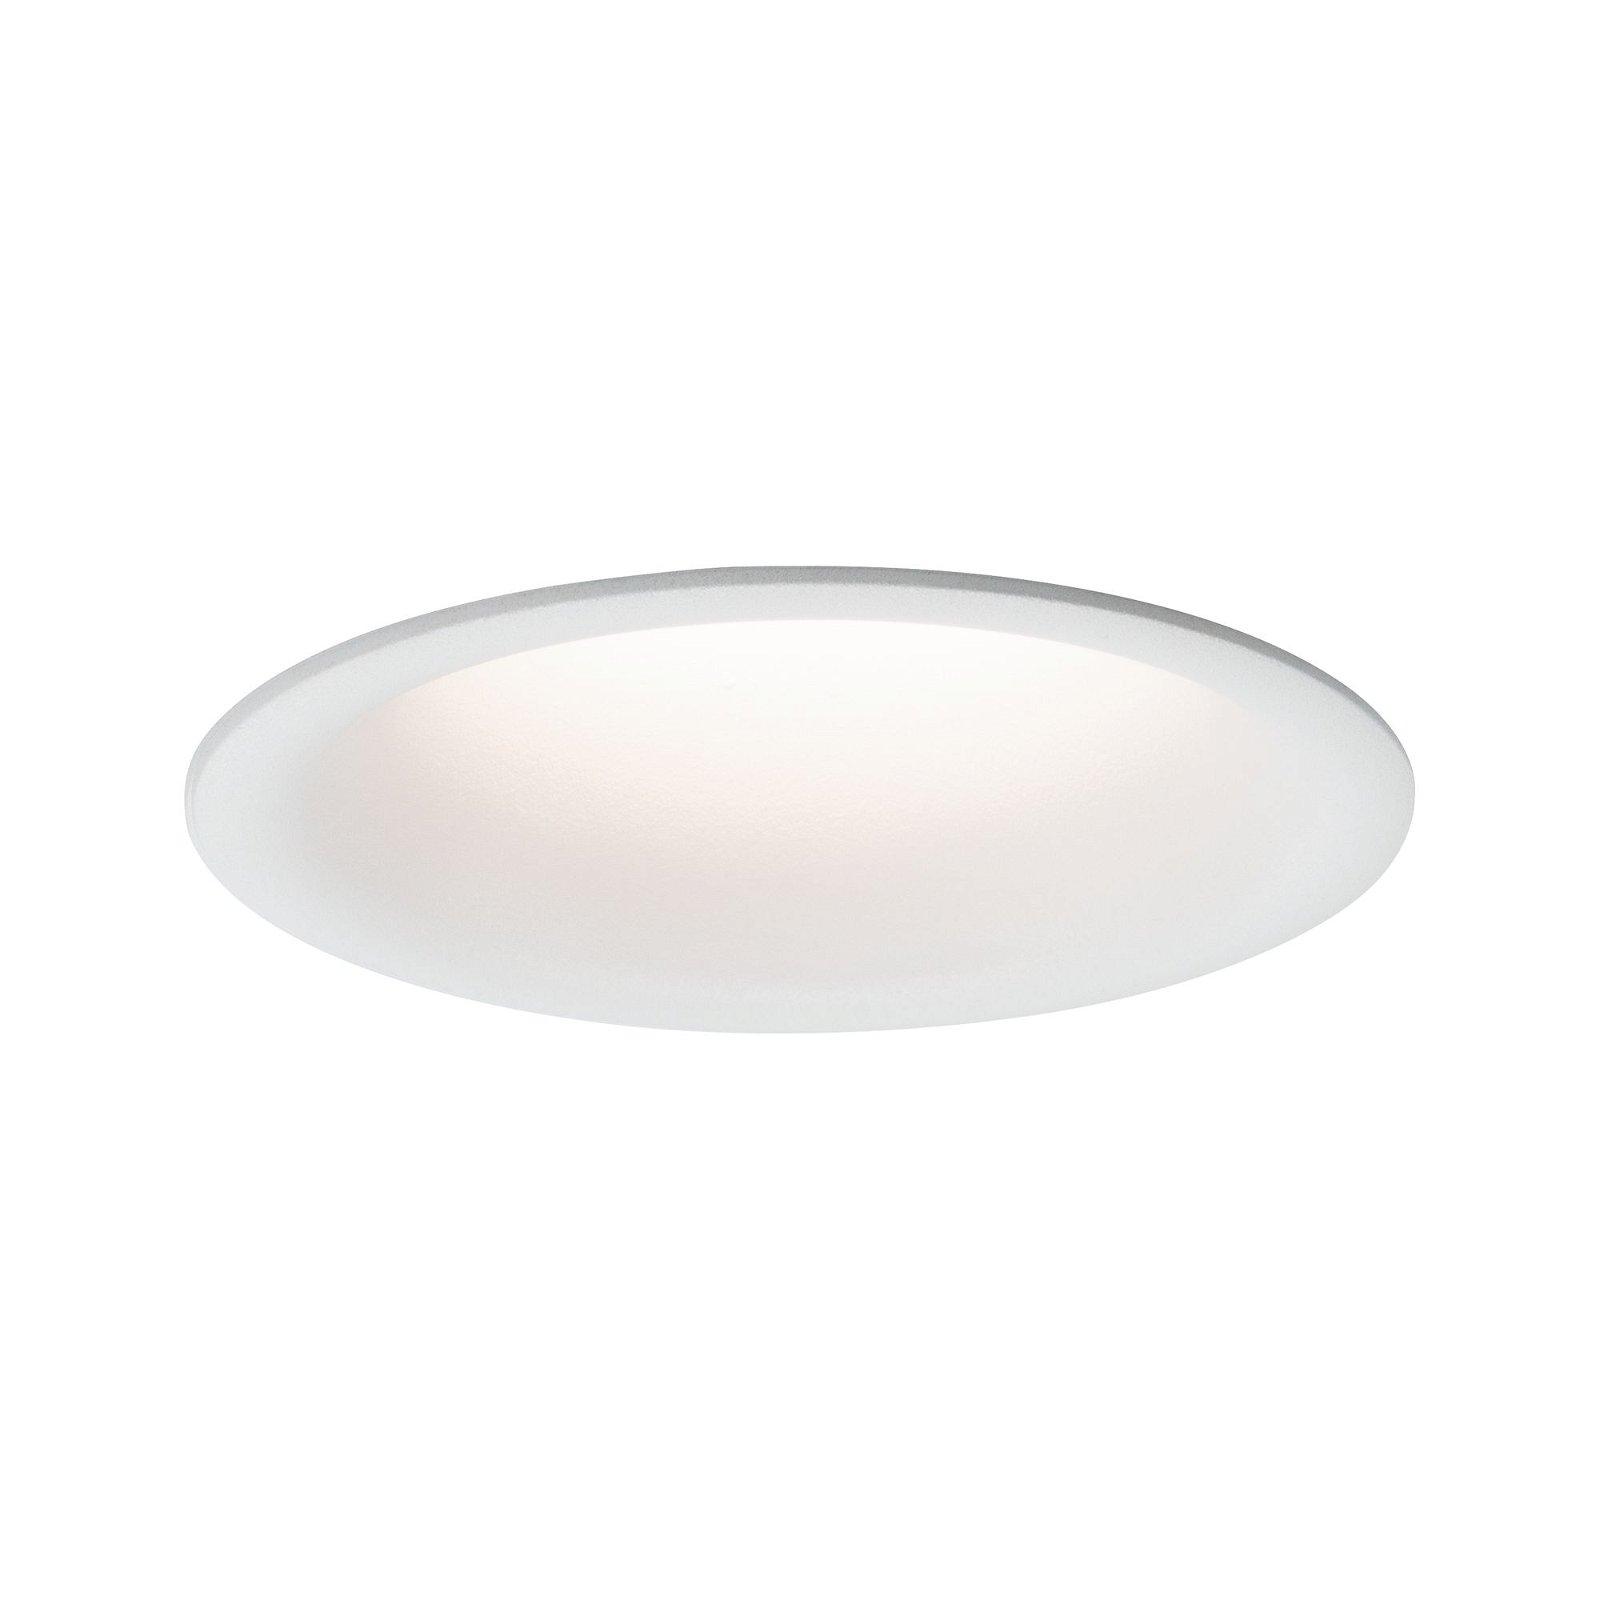 Spot encastré LED Cymbal Coin Kit de base IP44 77mm Coin 3x6,8W 3x500lm 230V 2700K Blanc dépoli